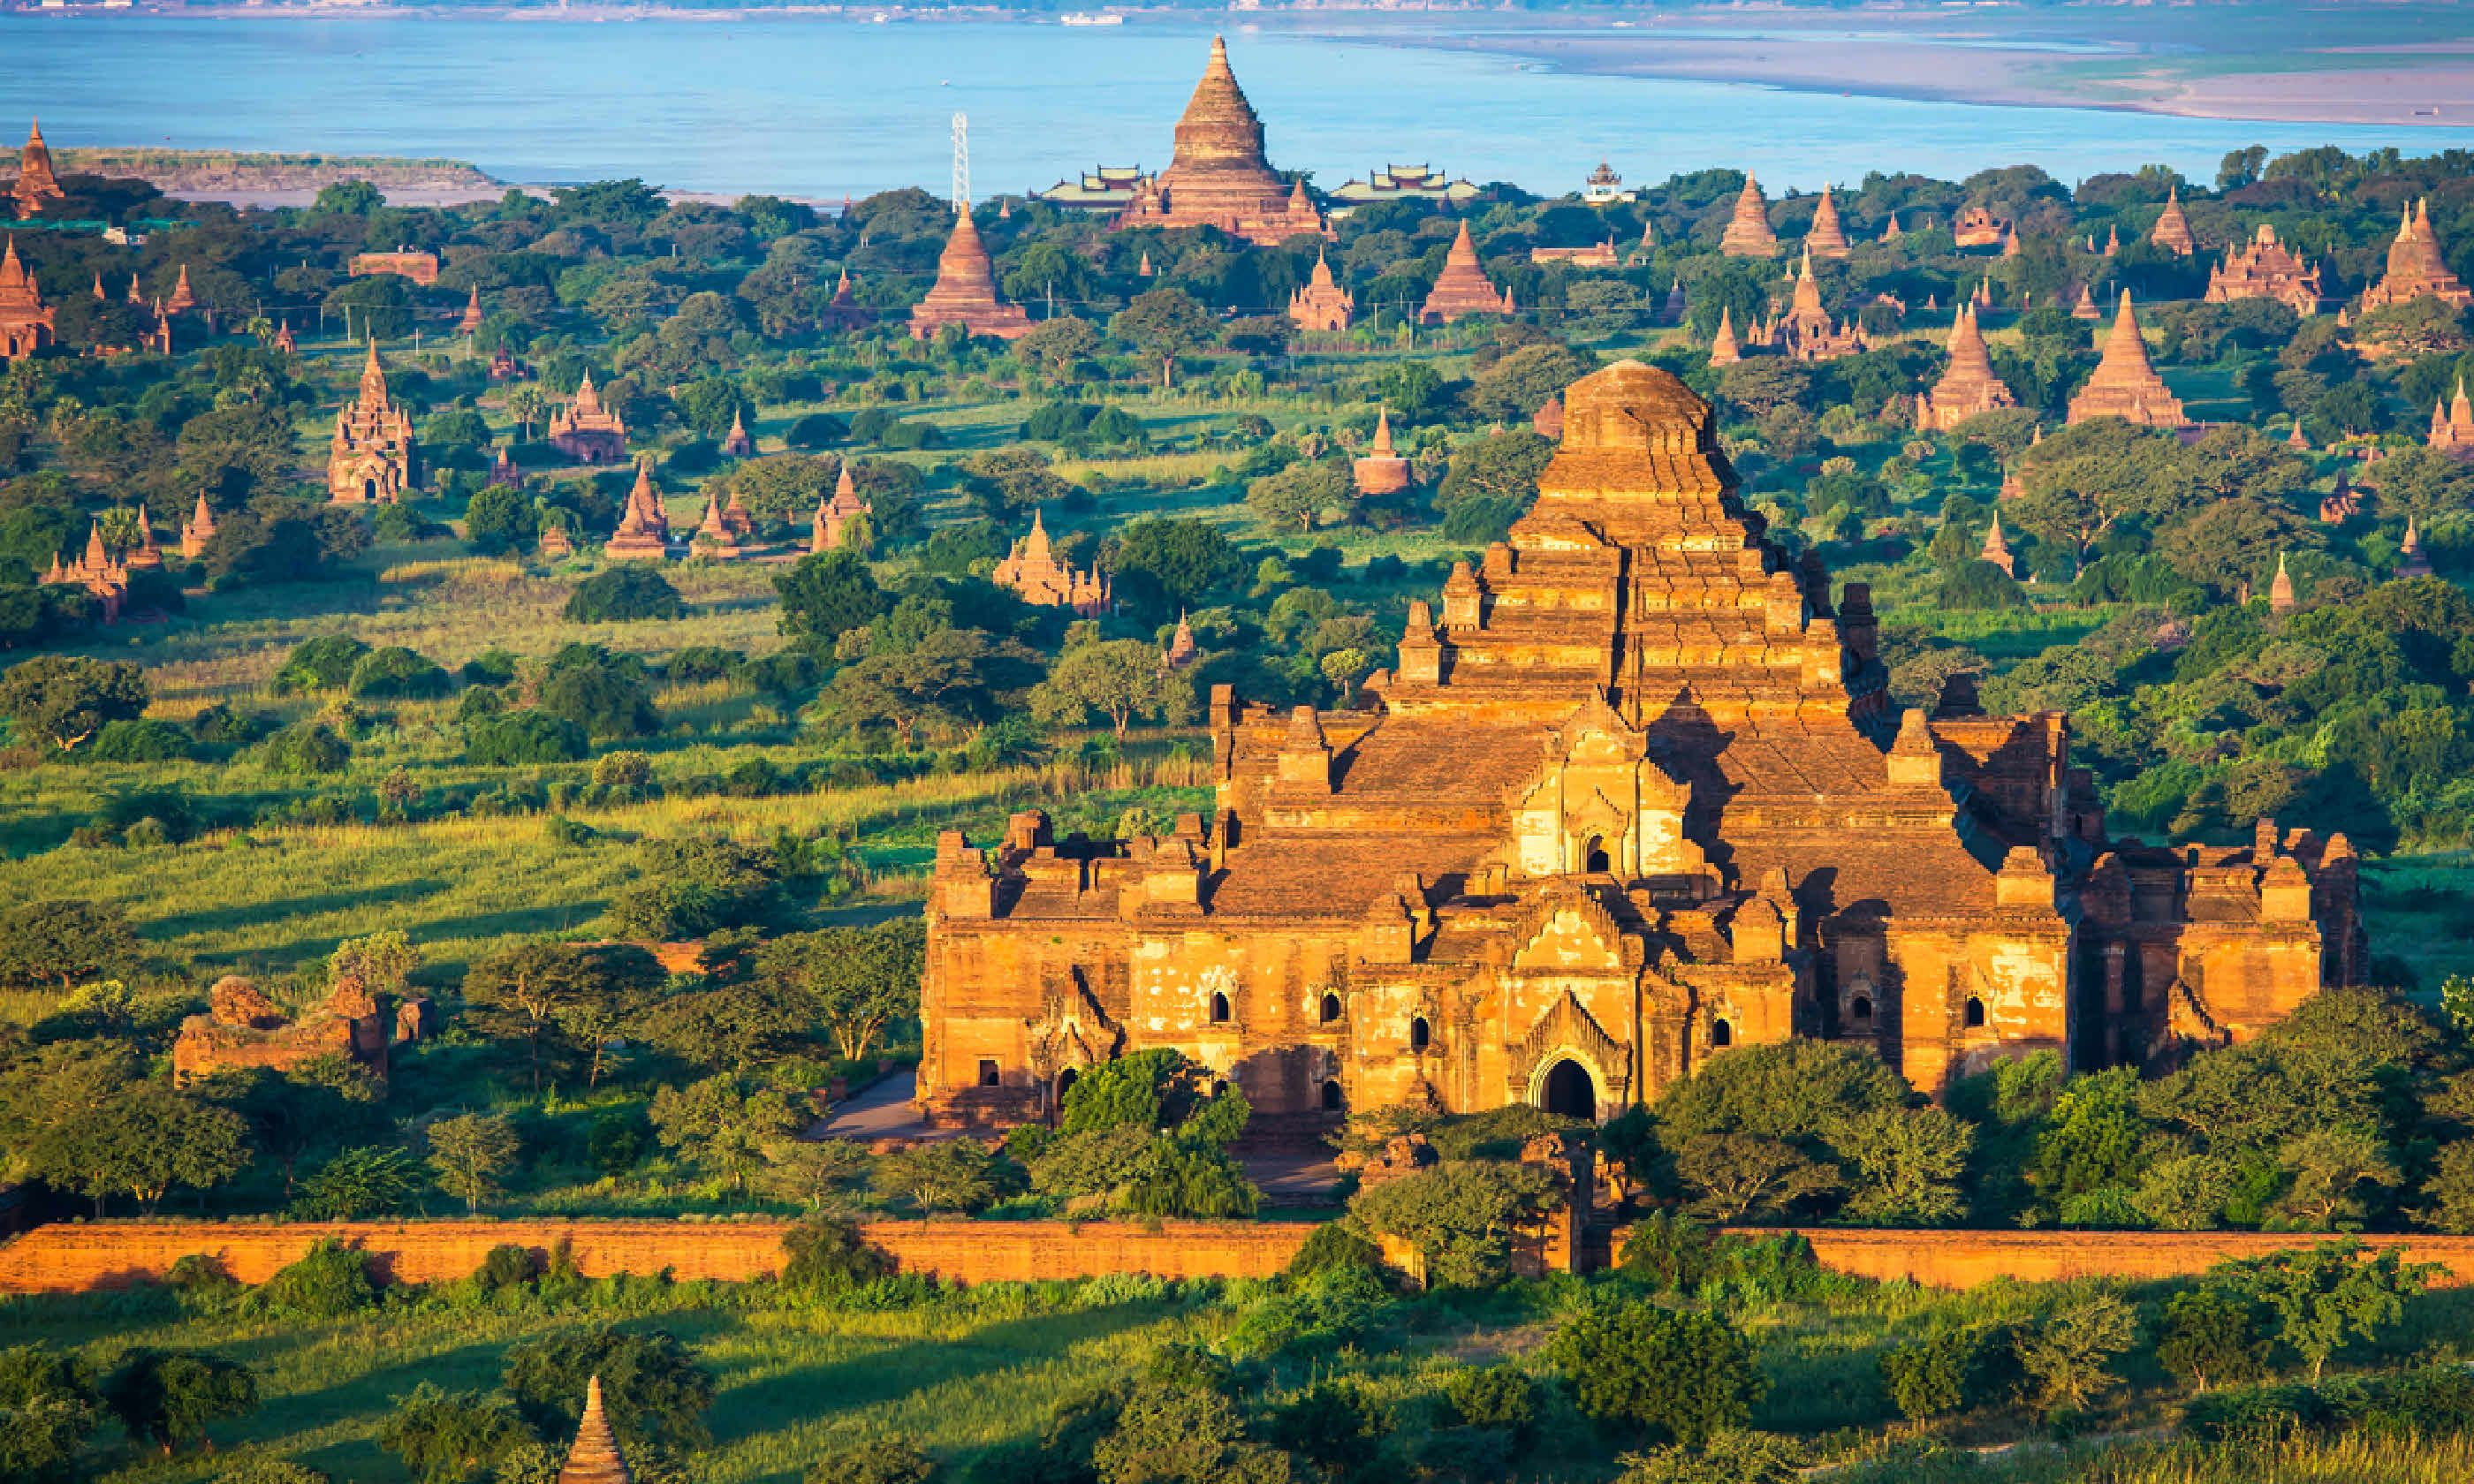 Ancient Pagodas in Bagan (Shutterstock)